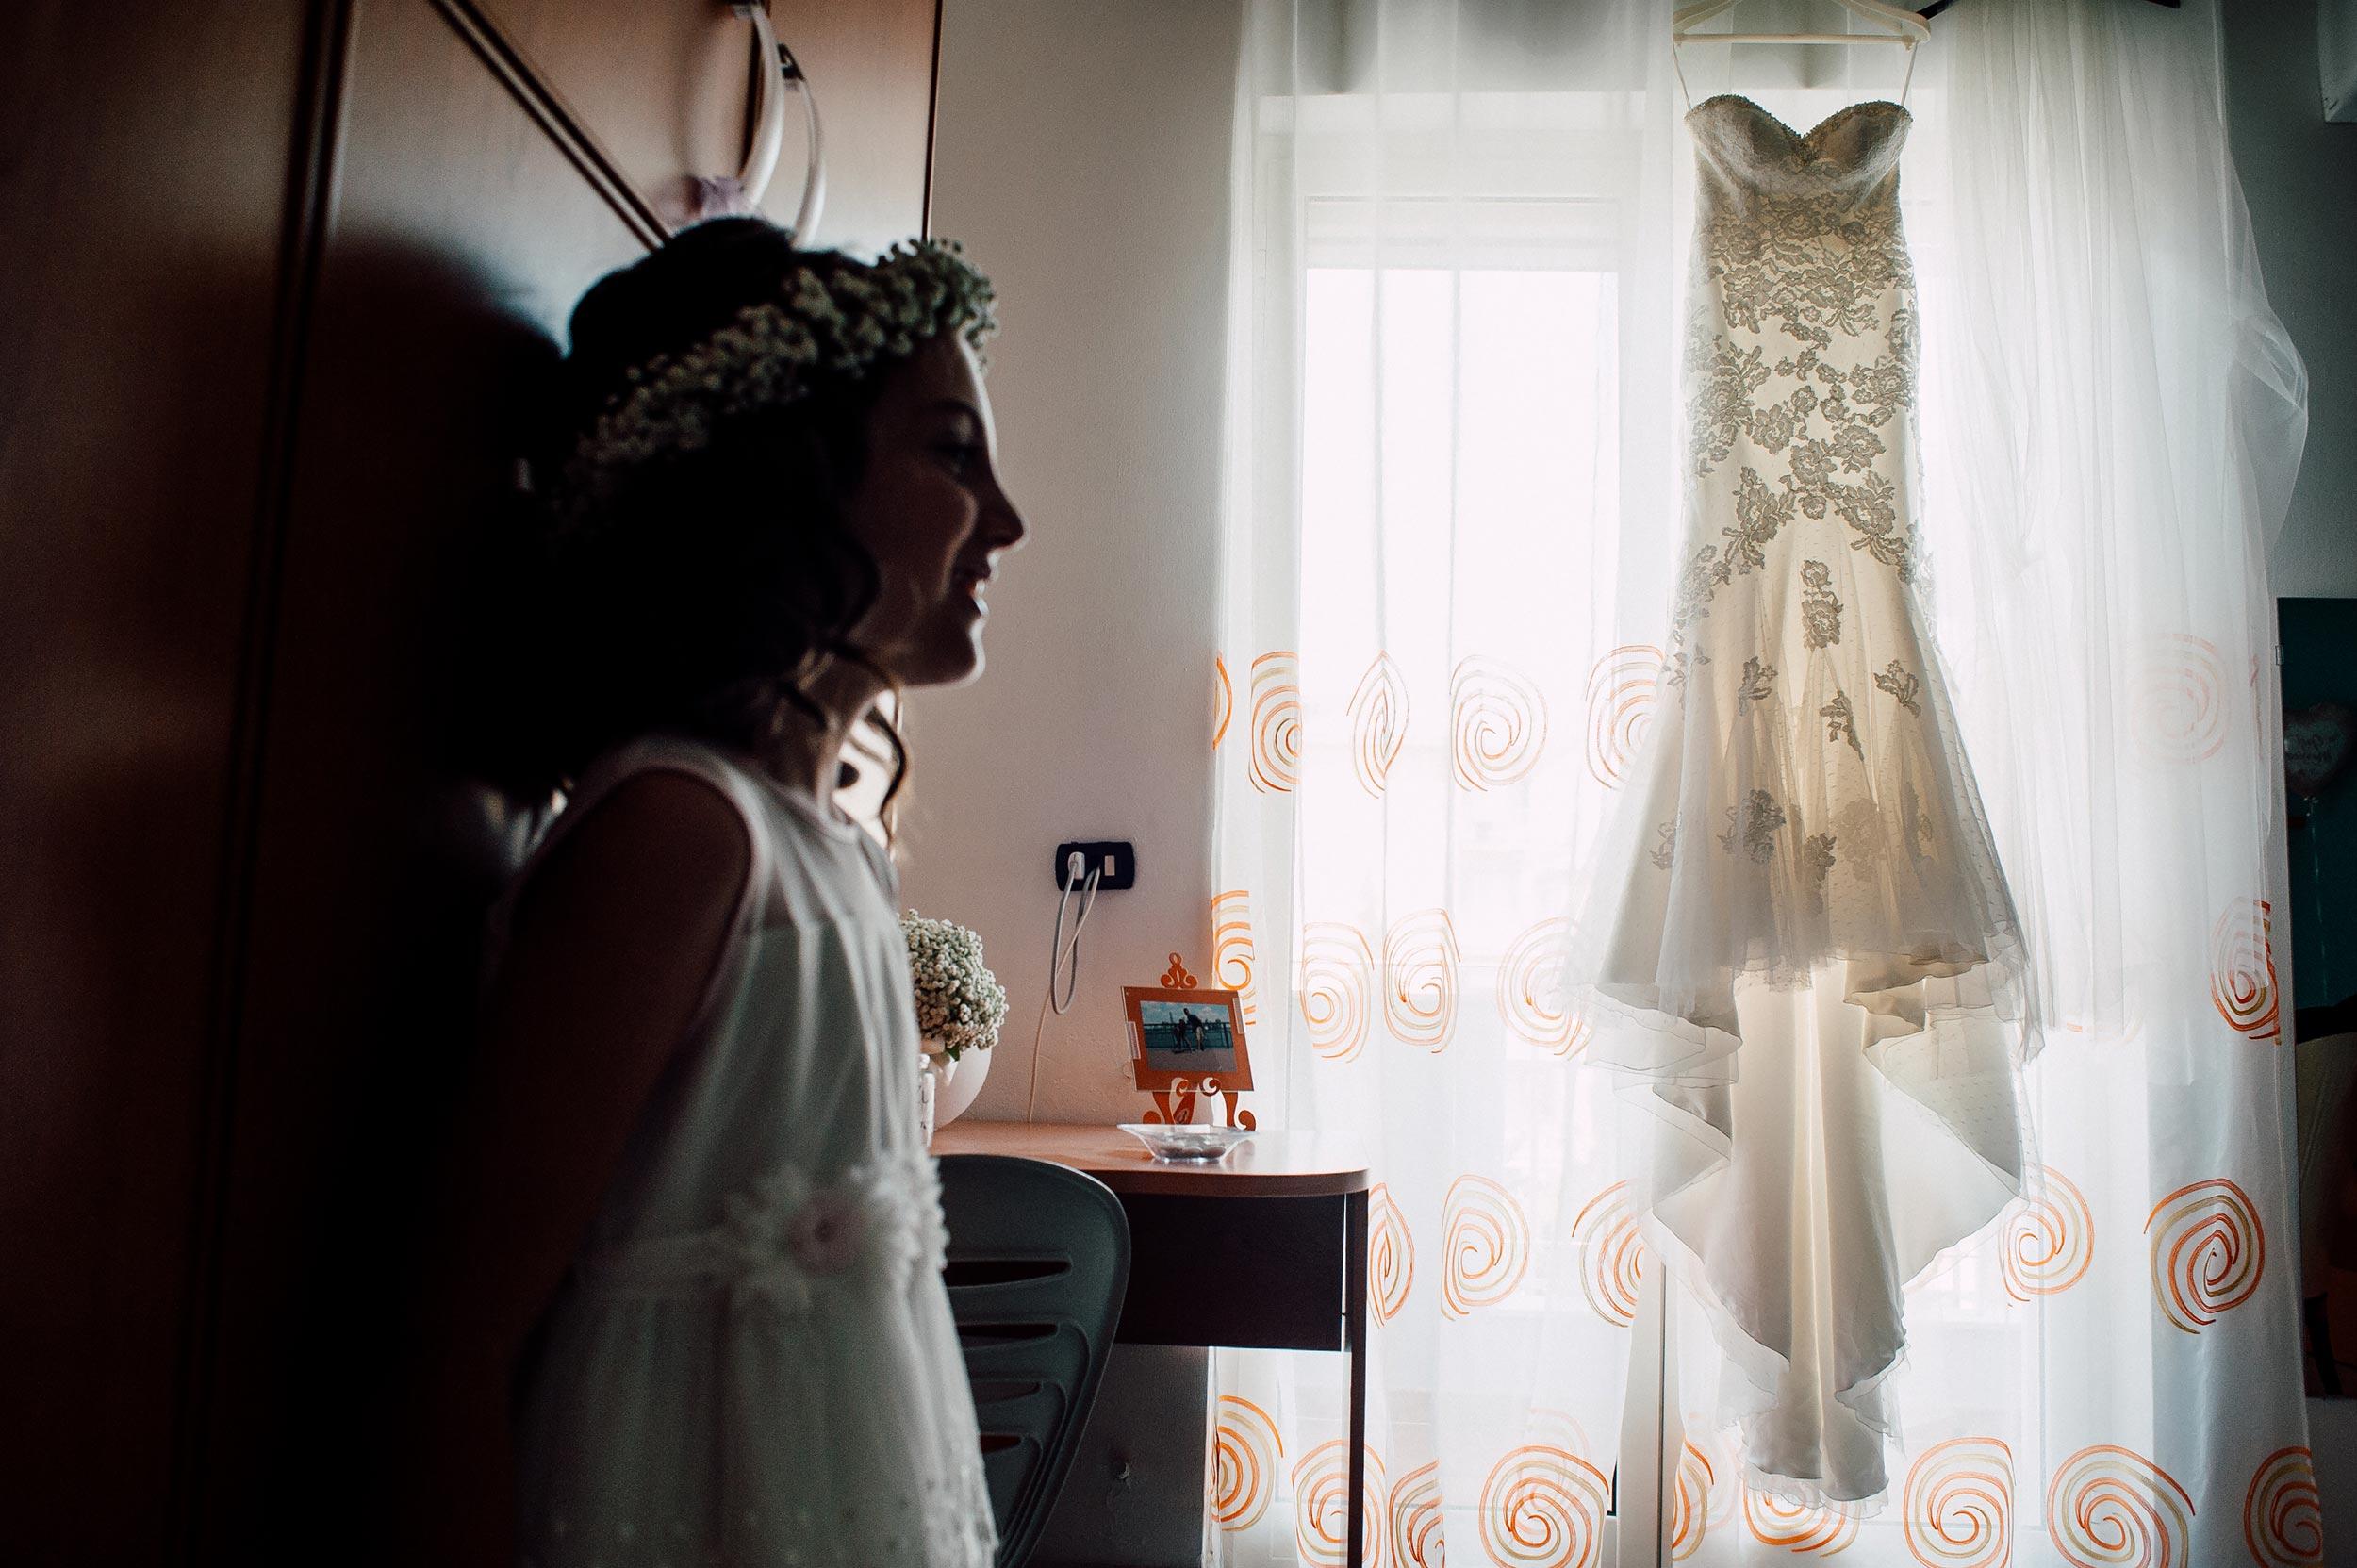 2016-Claudio-Teresa-Naples-Wedding-Photographer-Italy-Alessandro-Avenali-15.jpg